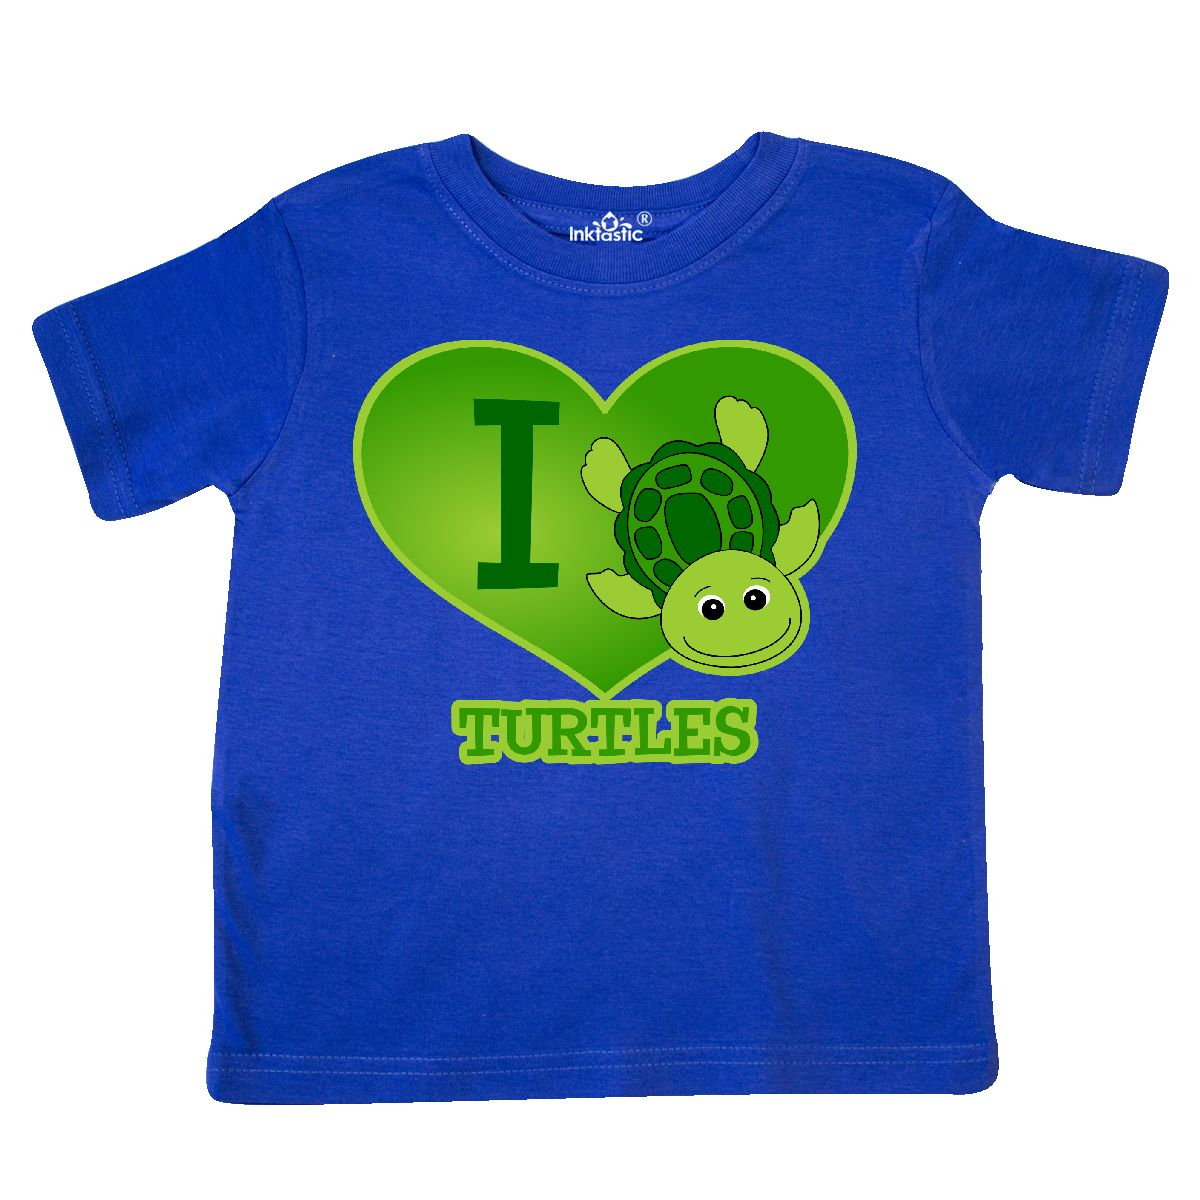 Inktastic-I-Love-Turtles-Toddler-T-Shirt-Cute-Heart-Sea-Turtle-Cartoon-Funny-Kid thumbnail 3